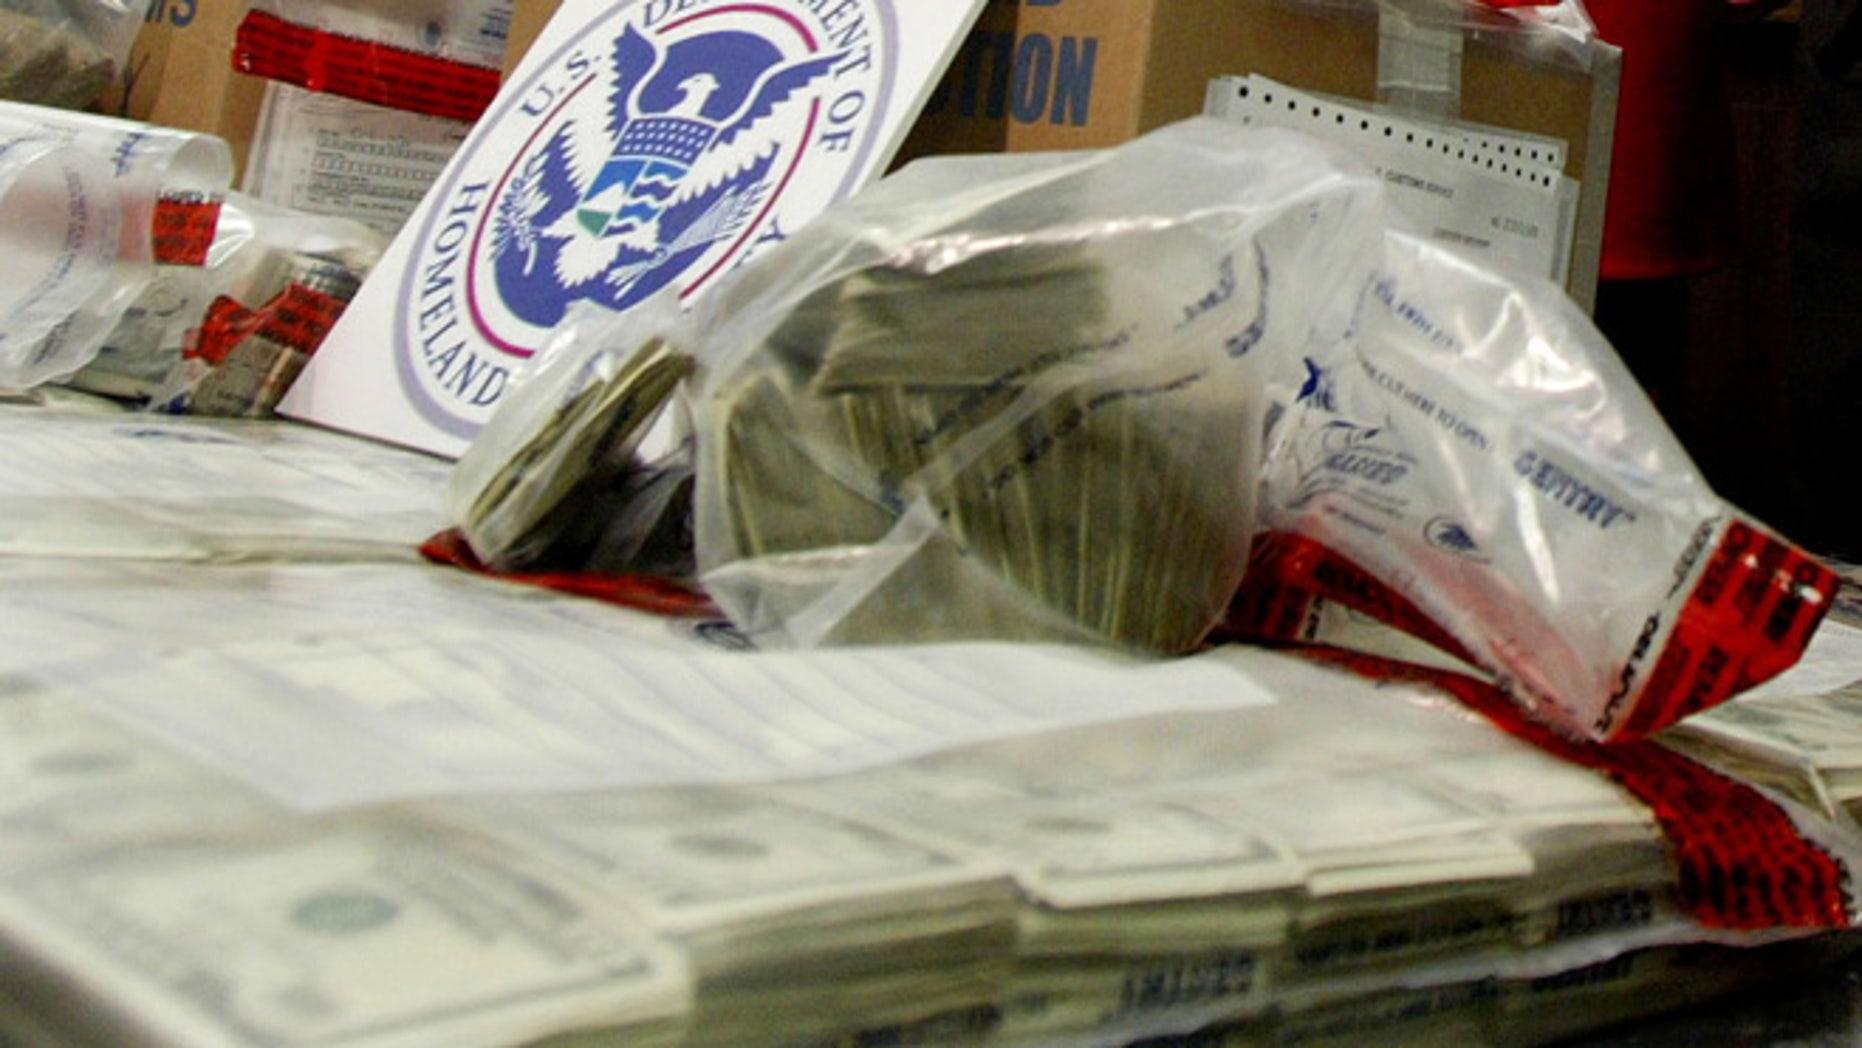 FILE: Nov. 2003: Cash seized in a federal investigation. (Reuters)